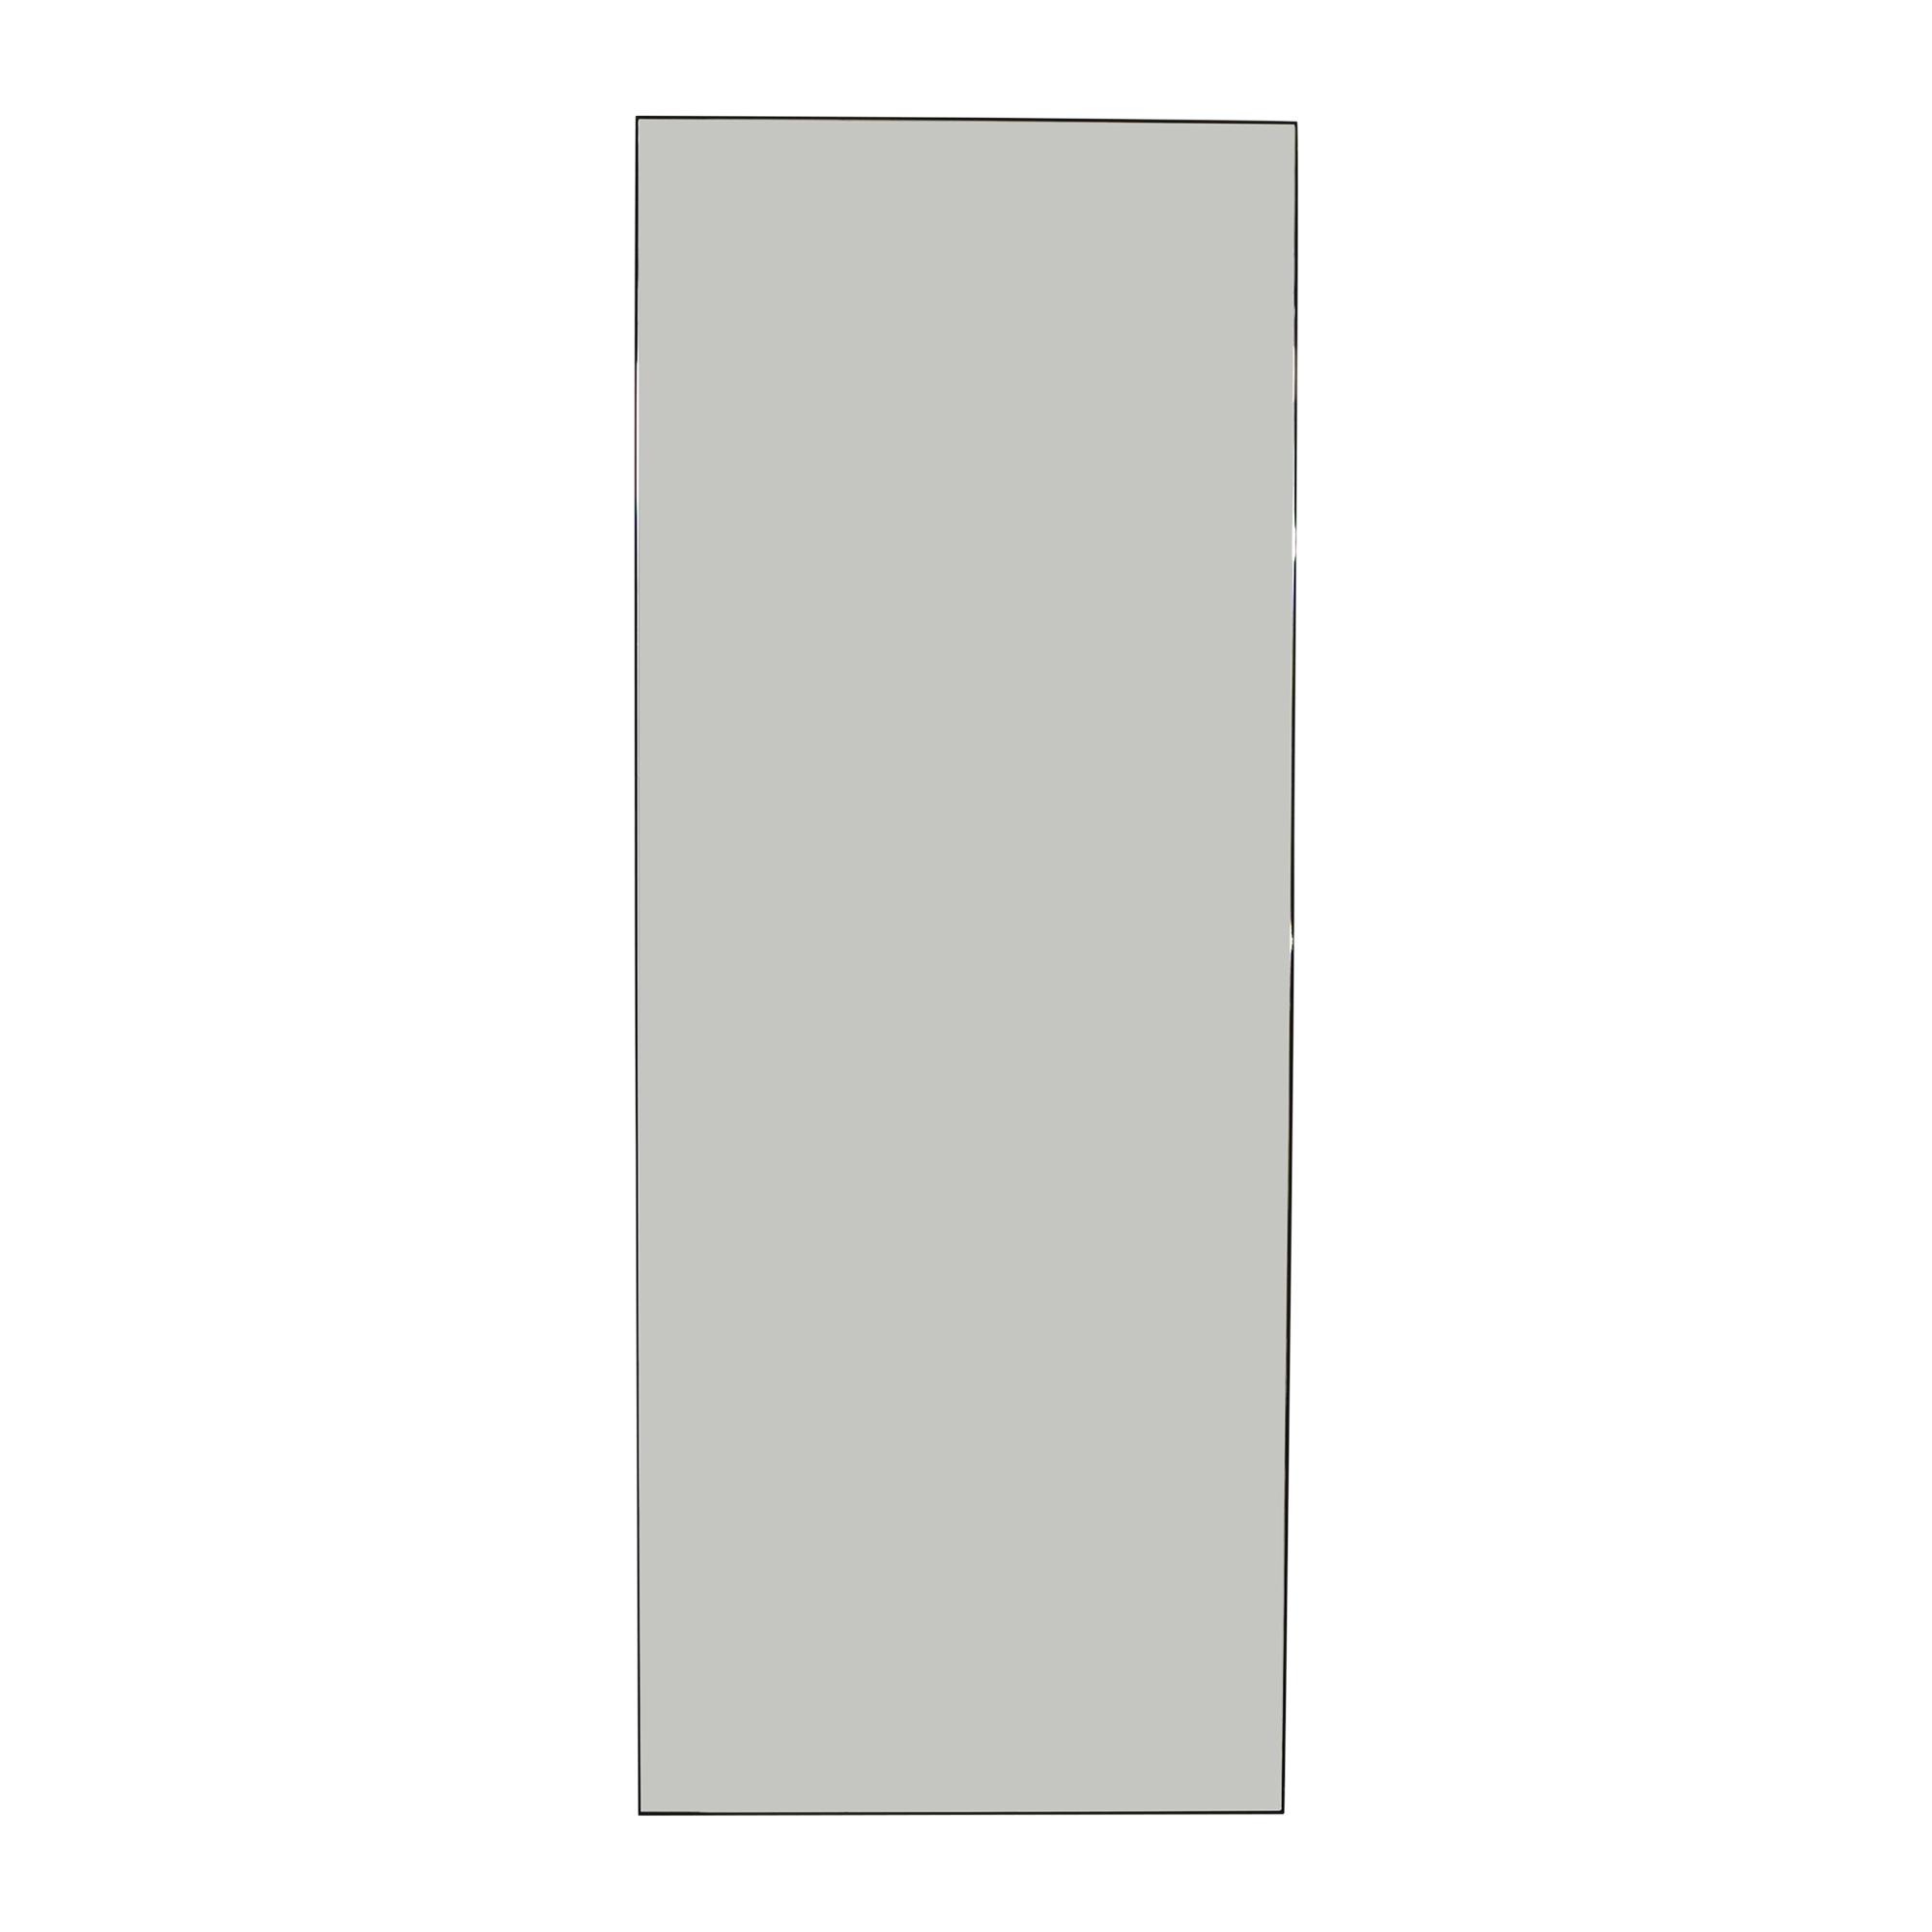 Room & Board Room & Board Infinity Mirror price